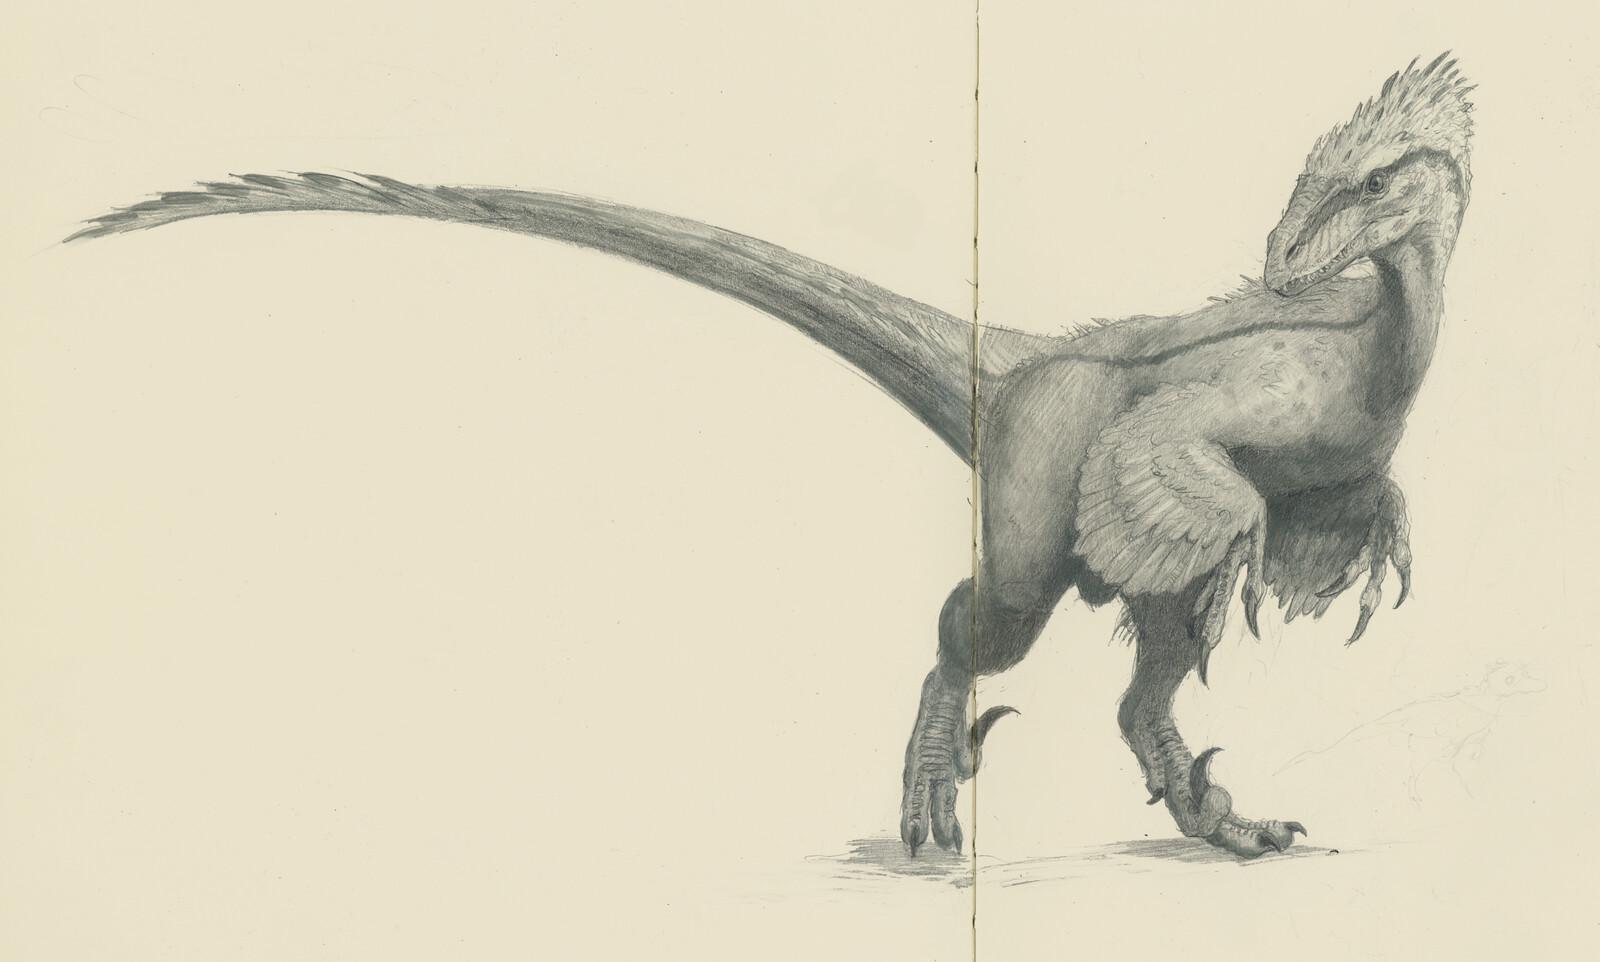 Dinosaurs on moleskine